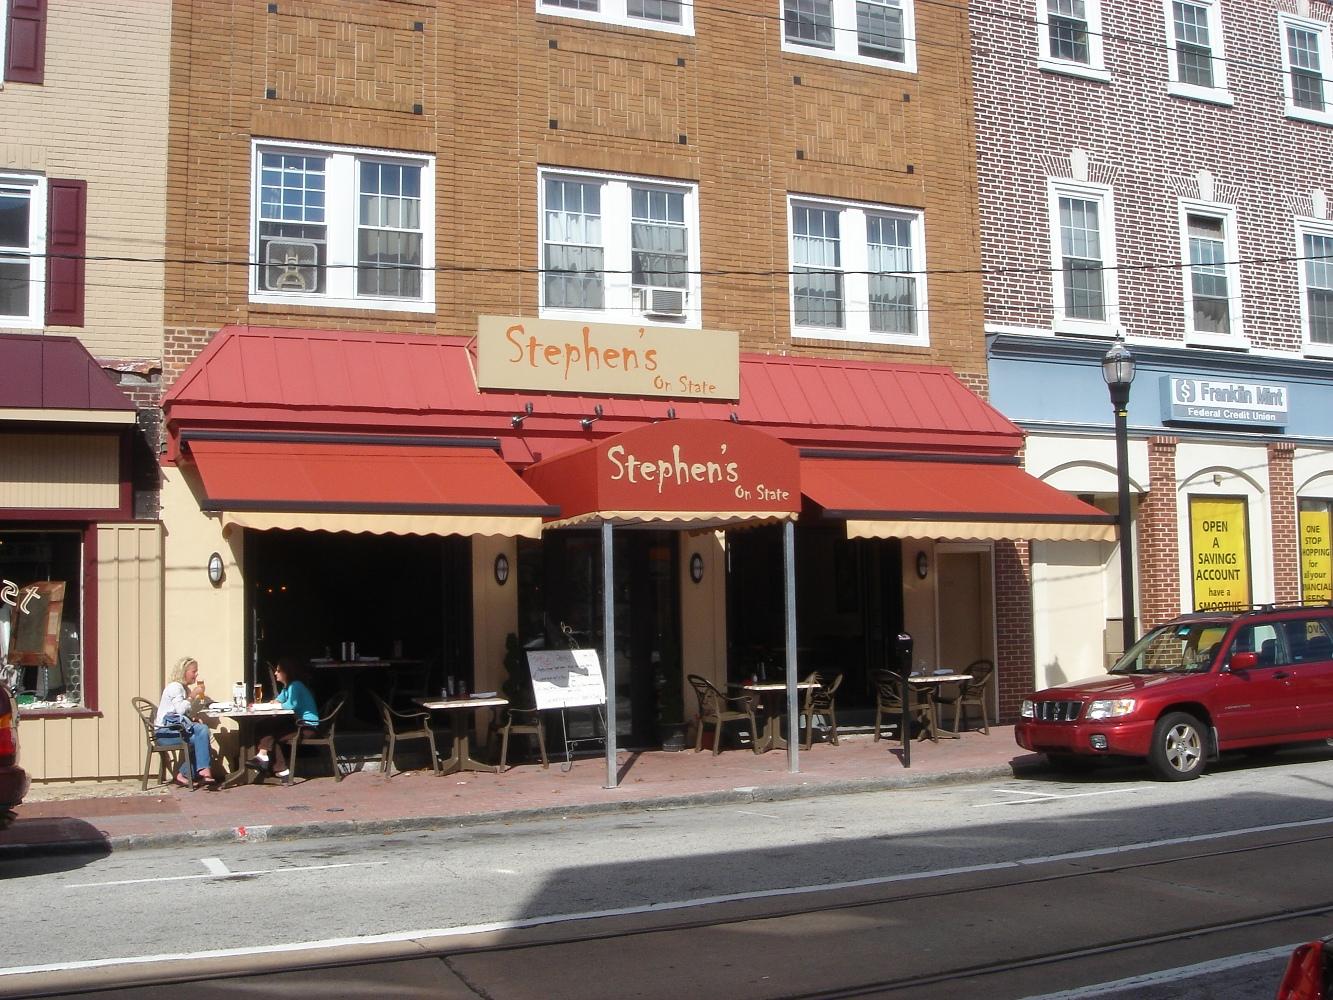 Outdoor Dining Cover, Restaurant Awnings Philadelphia